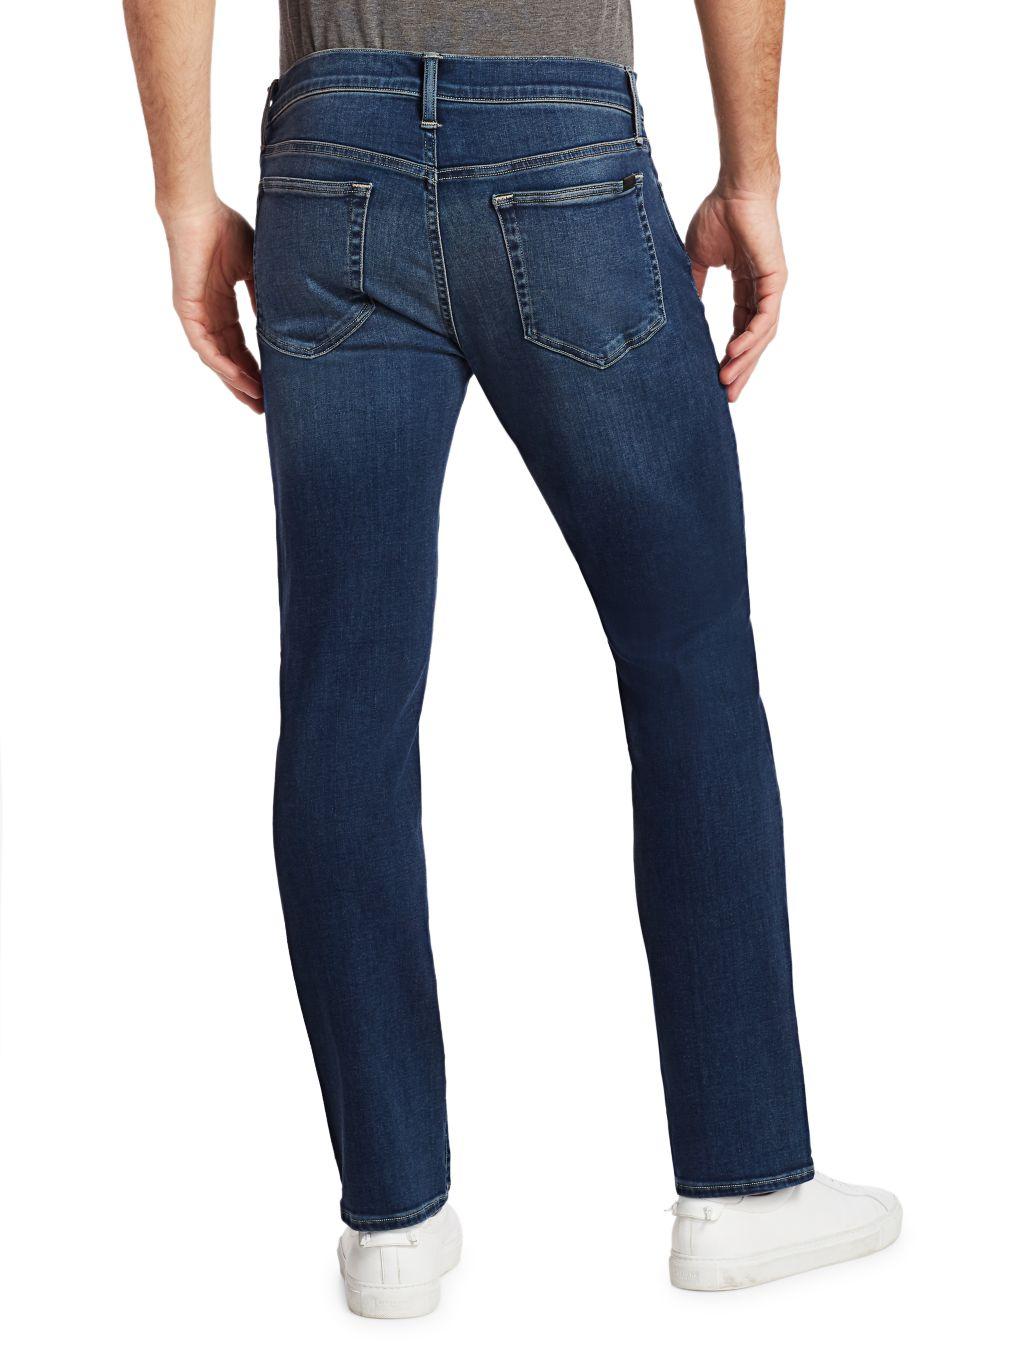 Joe's Jeans The Classic Rick Straight Jeans